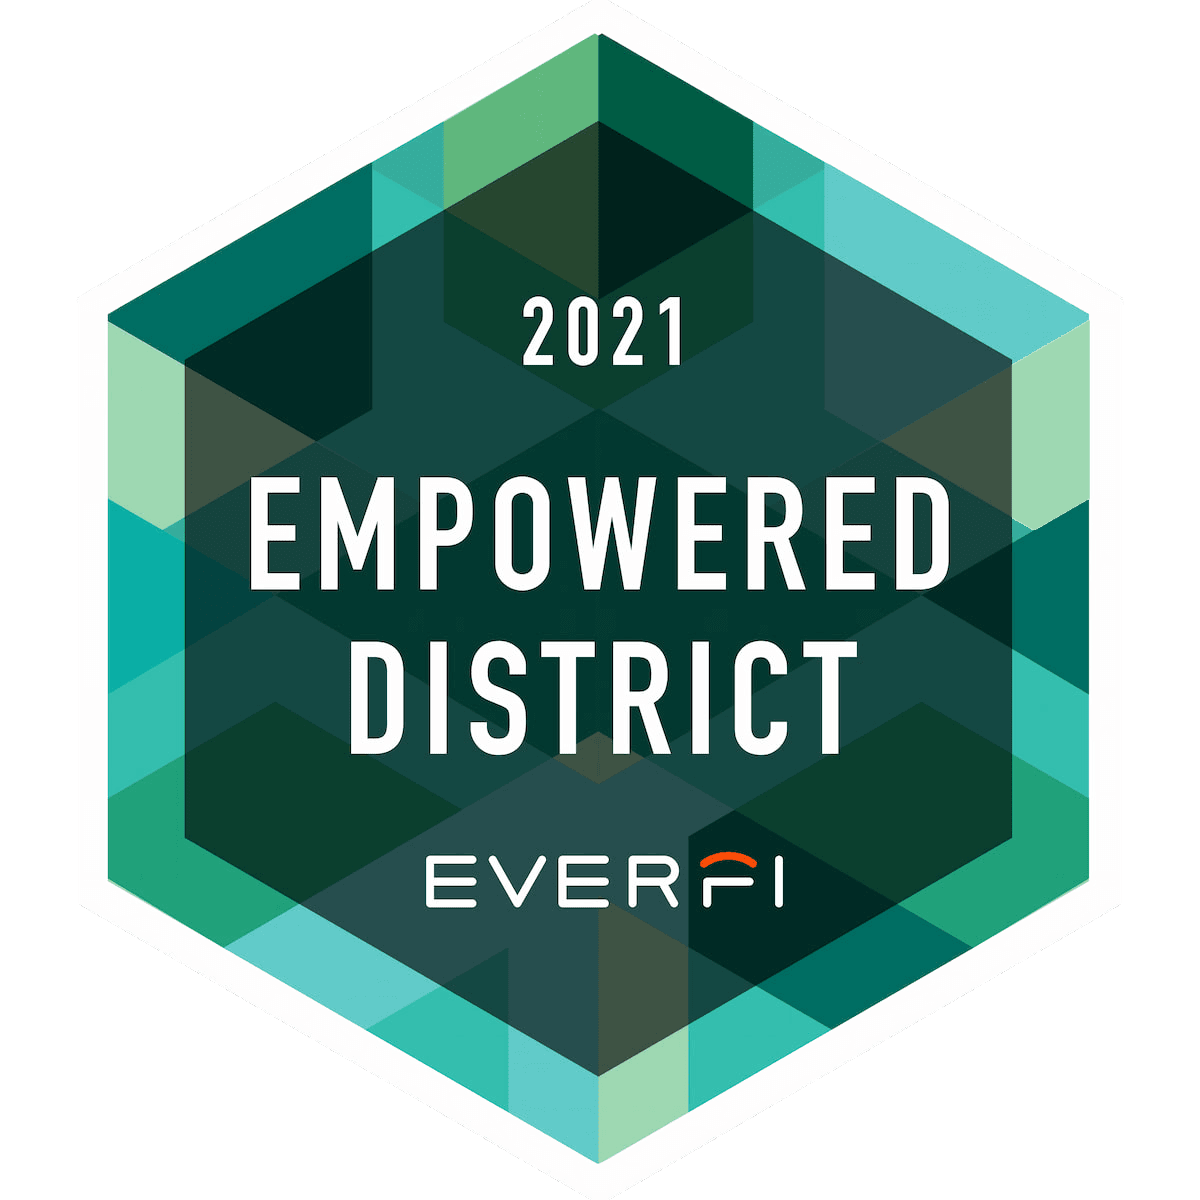 empowered-district-2021